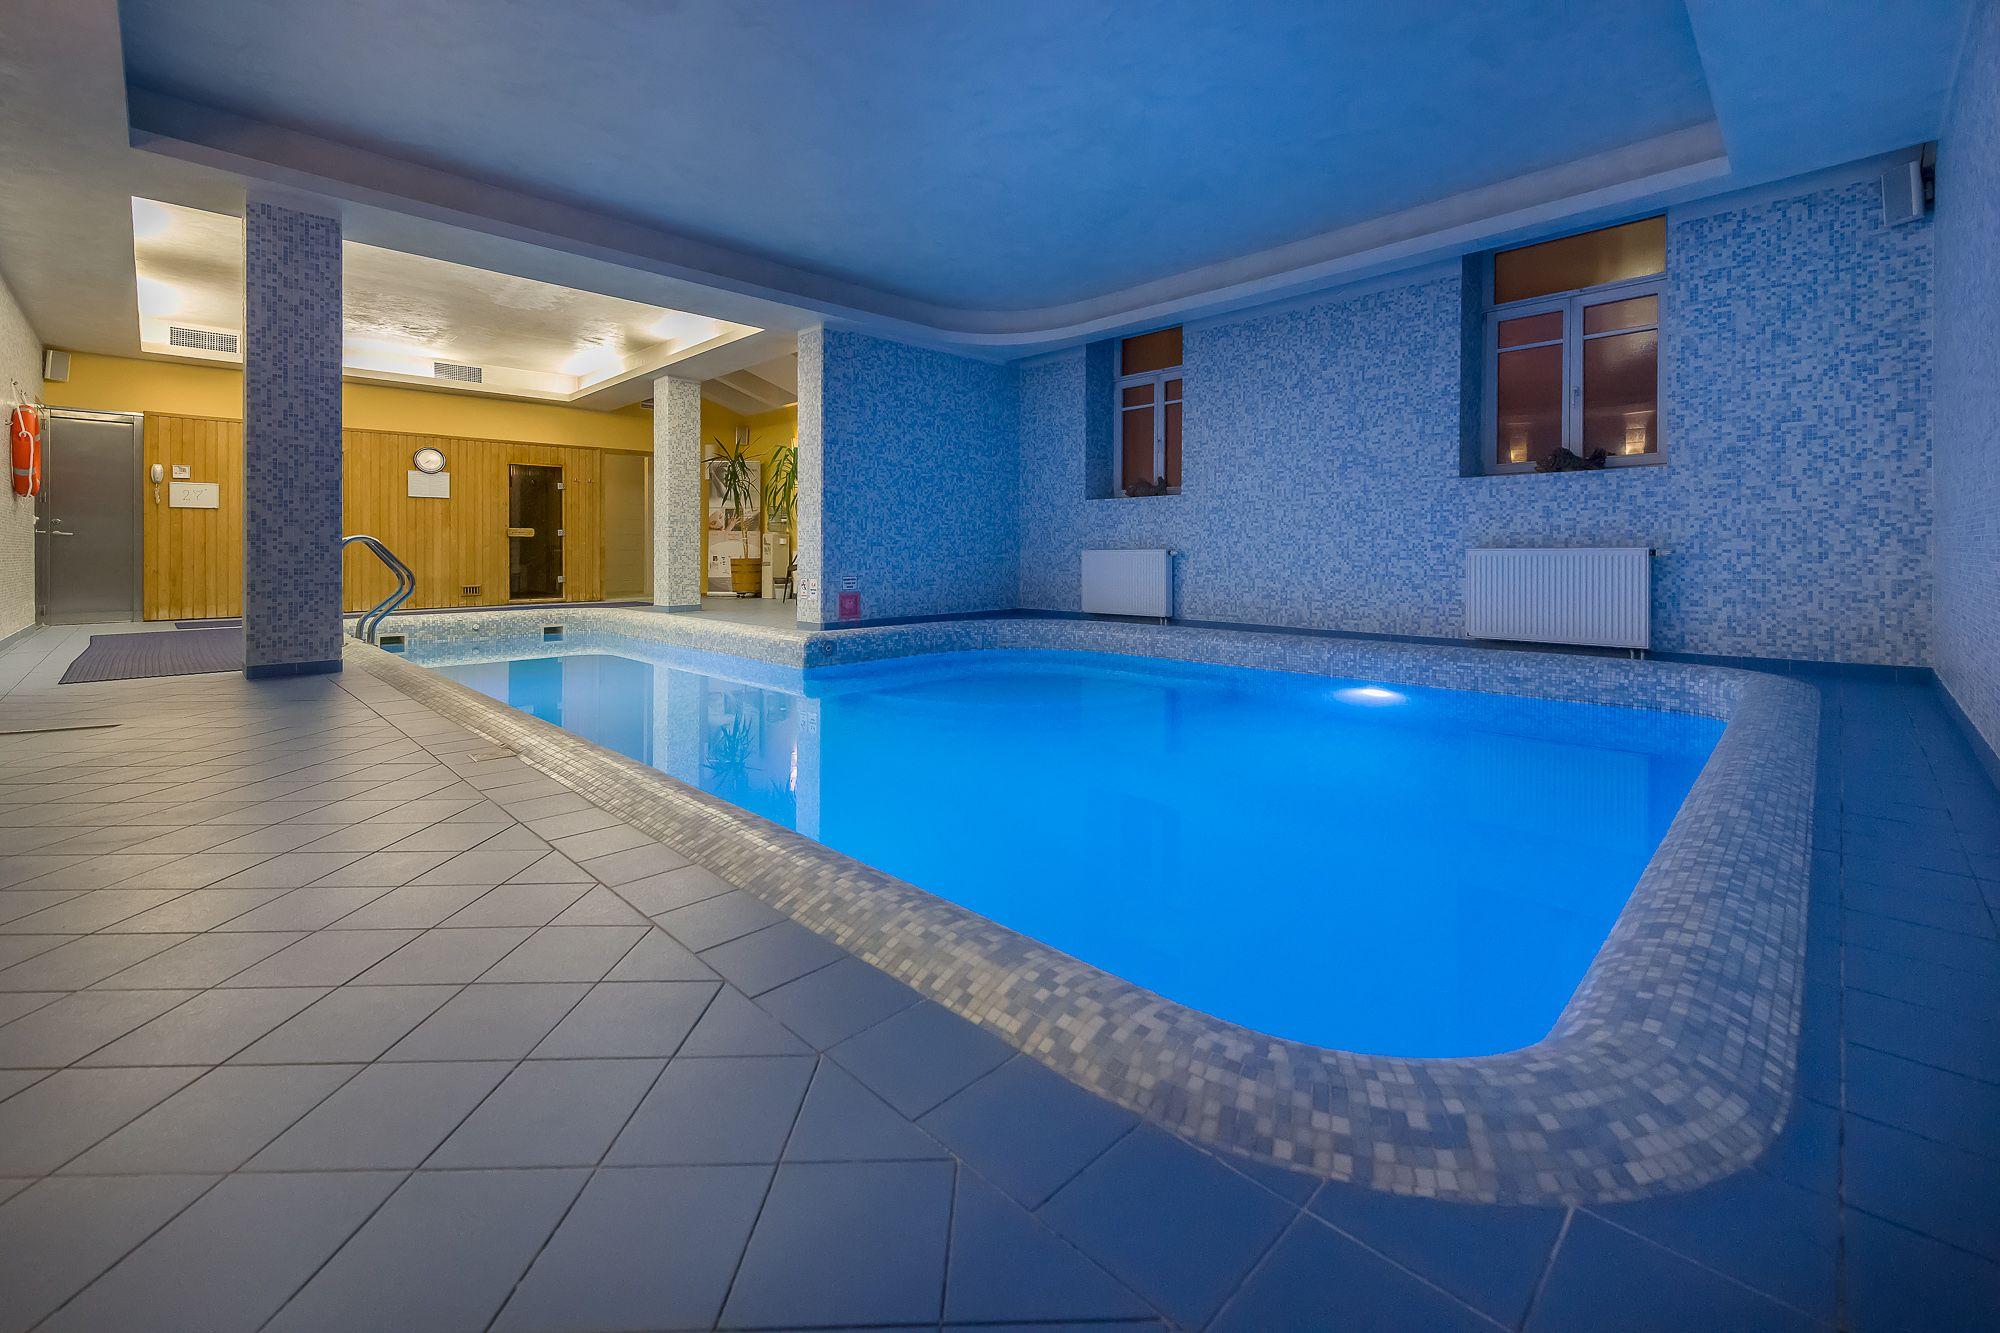 Artis Hotel Pool